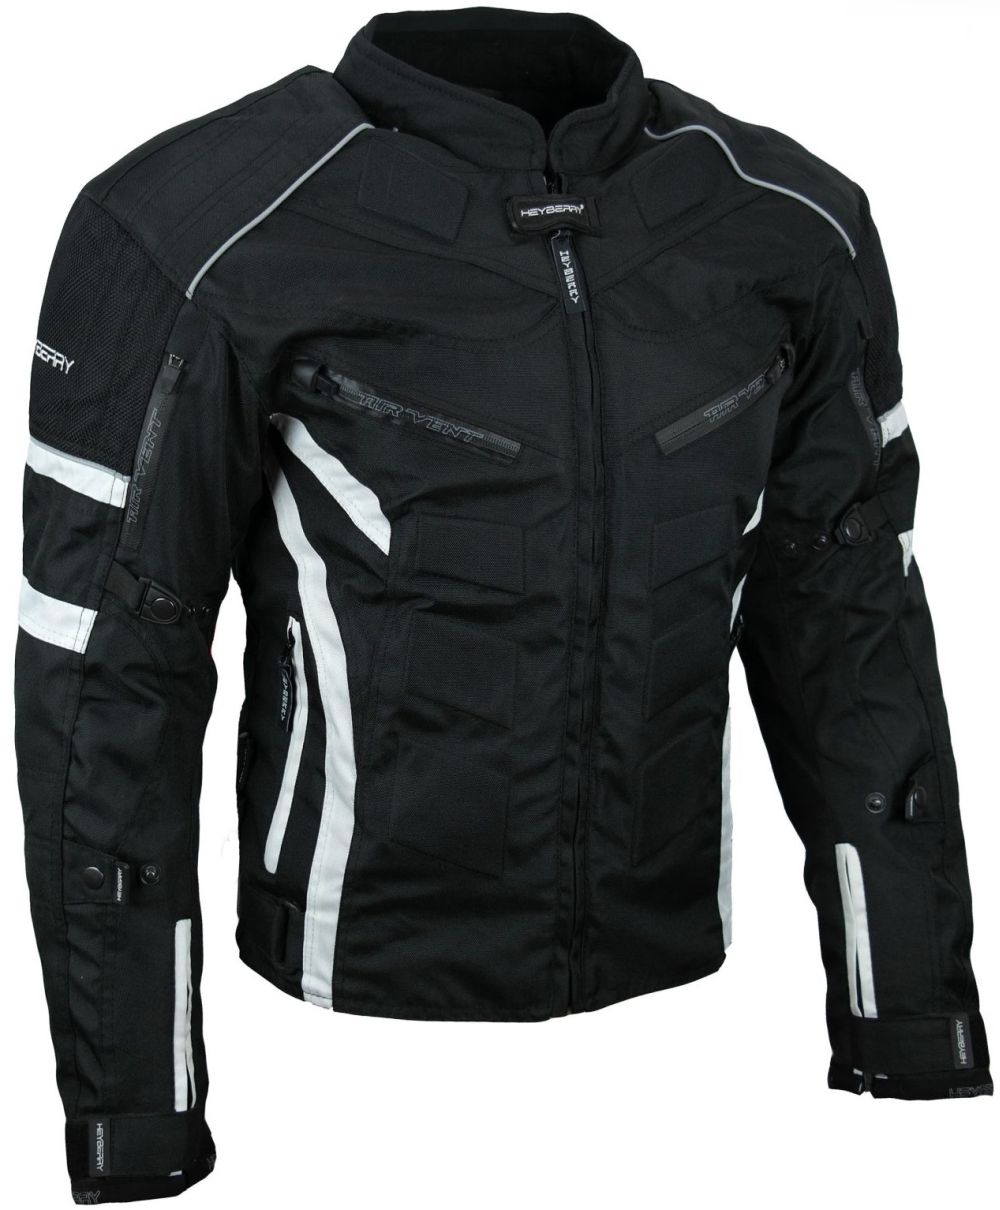 Kurze Textil Motorrad Jacke Motorradjacke Schwarz Weiß Gr. M - 3XL